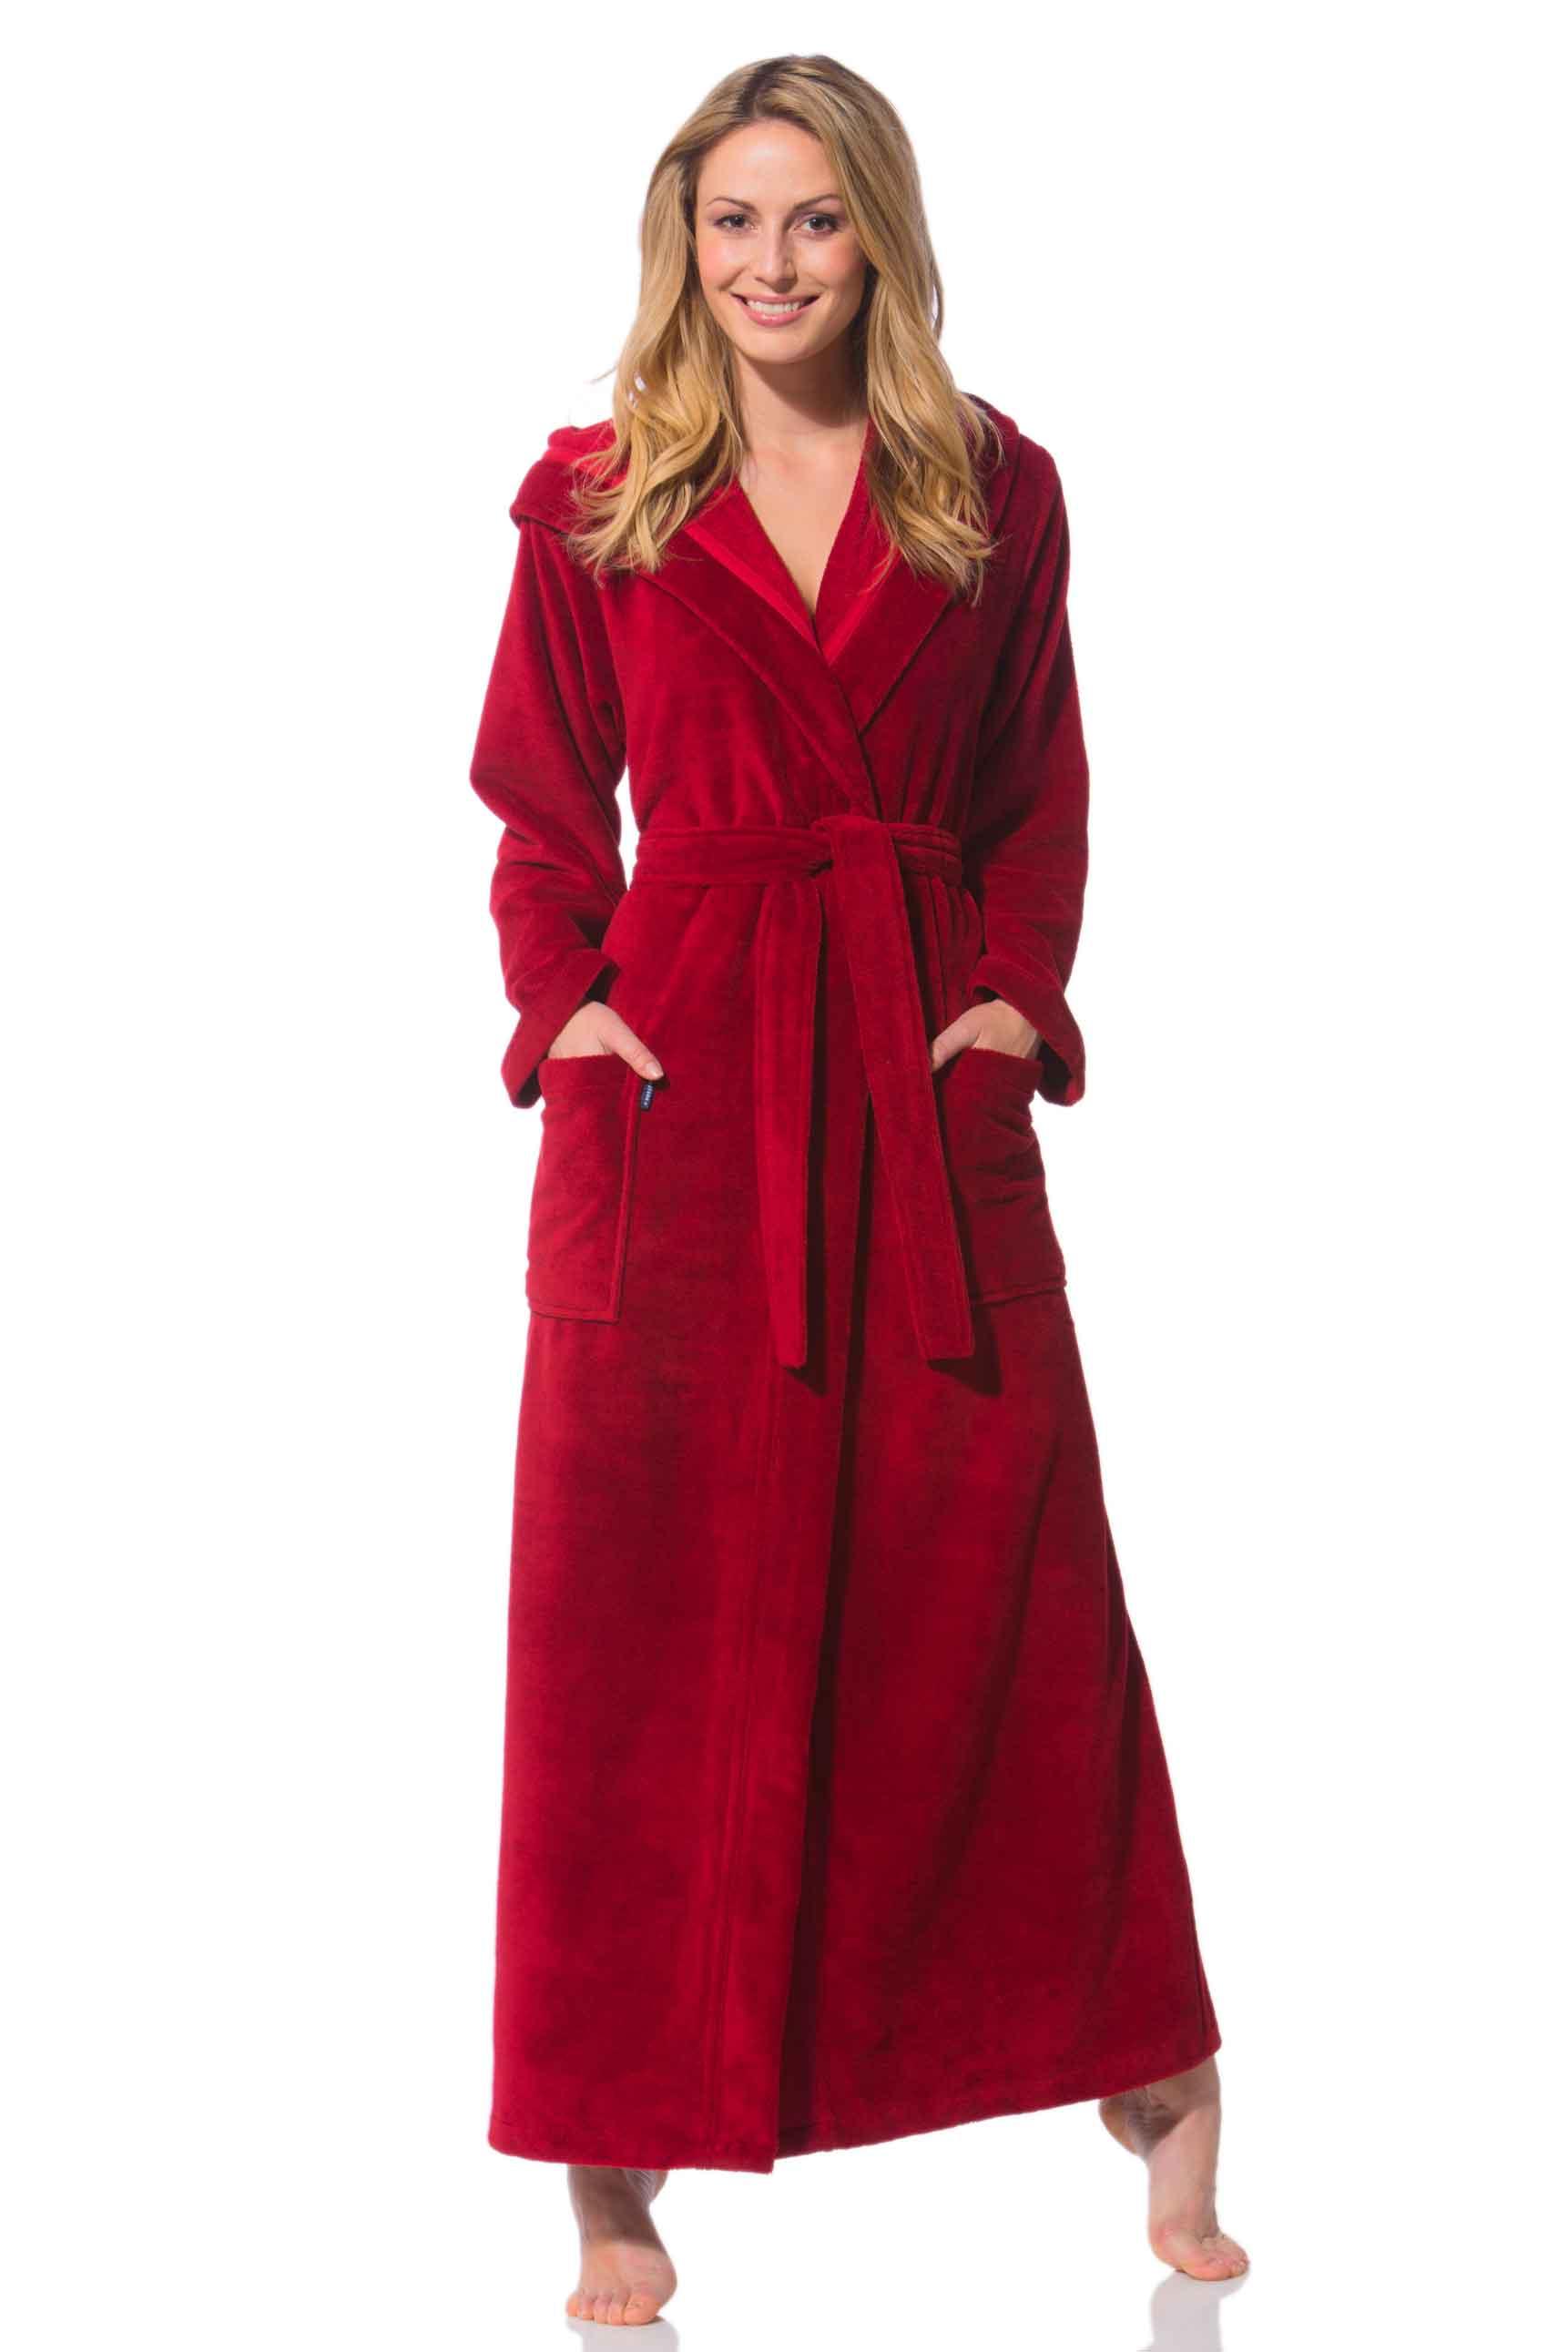 Bademantel Damen Lang : bademantel damen extra lang rot morgenstern ~ Watch28wear.com Haus und Dekorationen